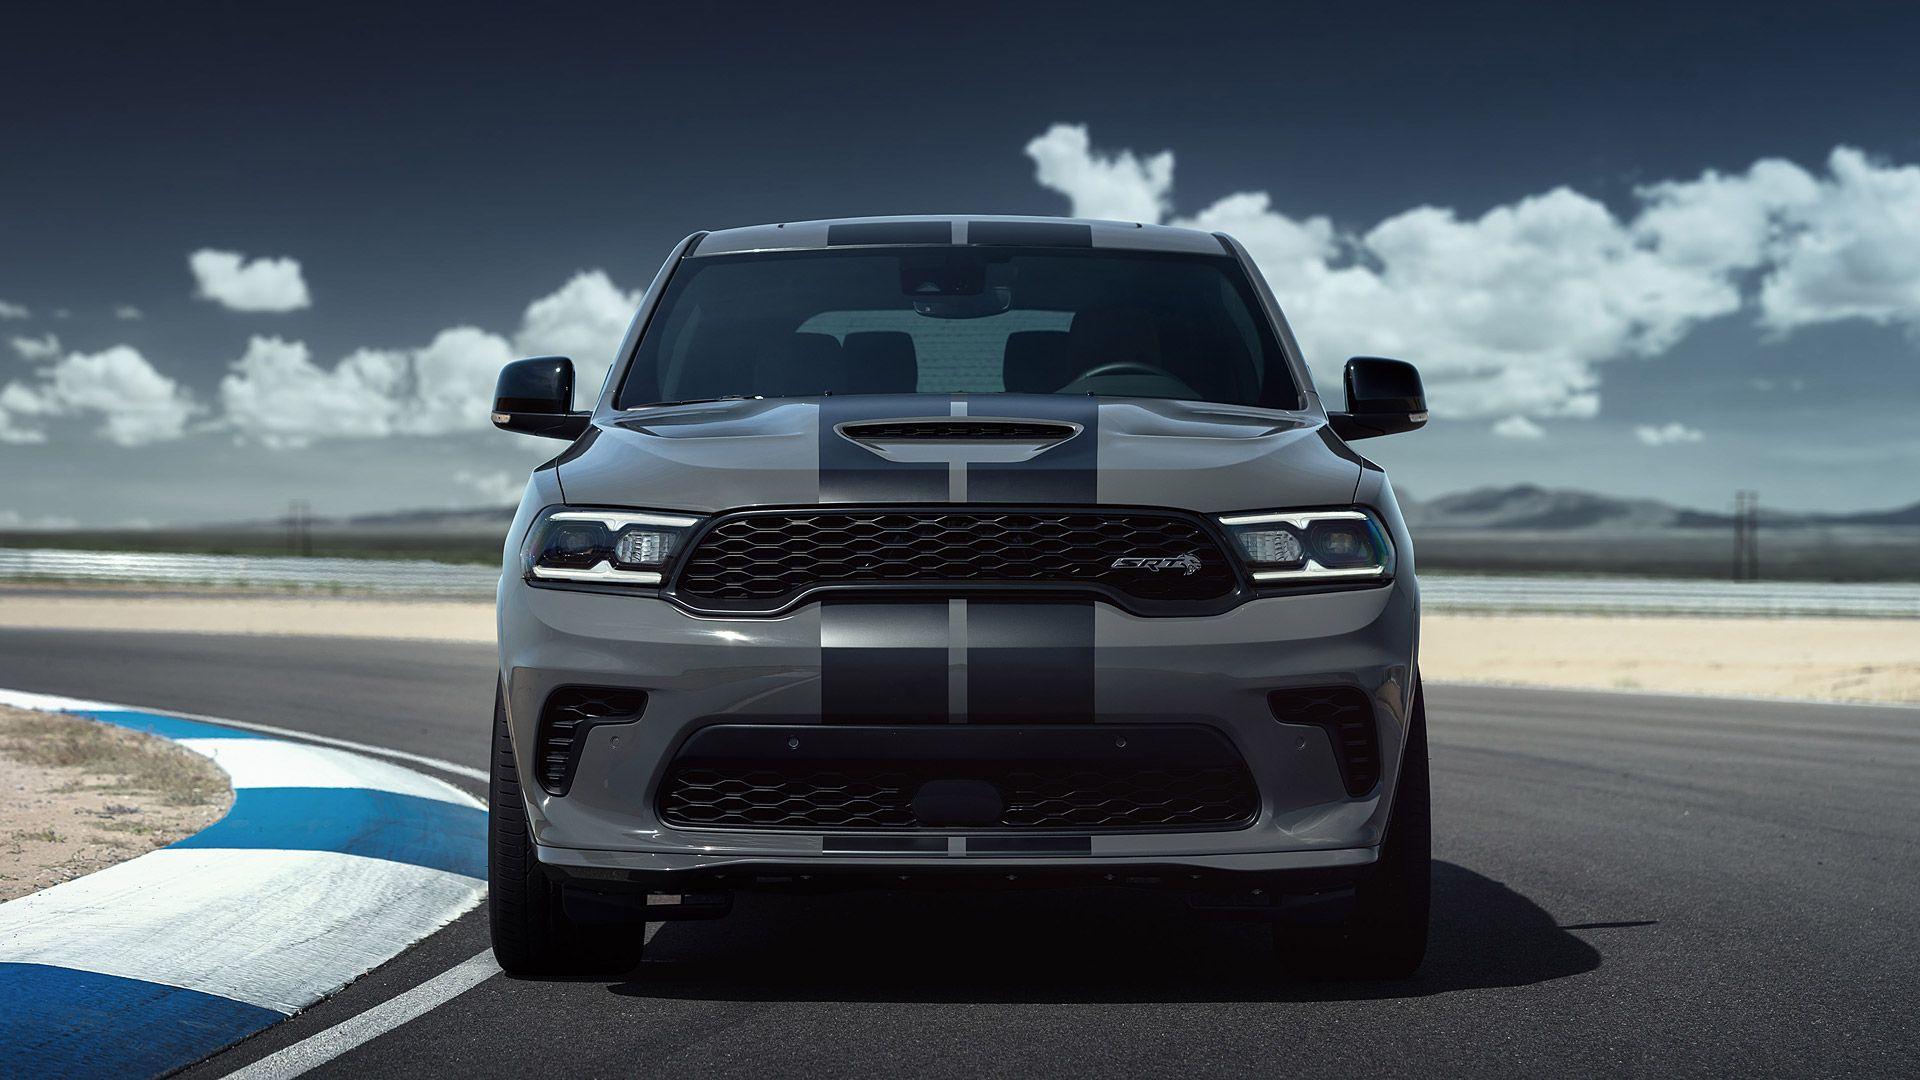 Dodge Durango 4k Wallpapers Top Free Dodge Durango 4k Backgrounds Wallpaperaccess